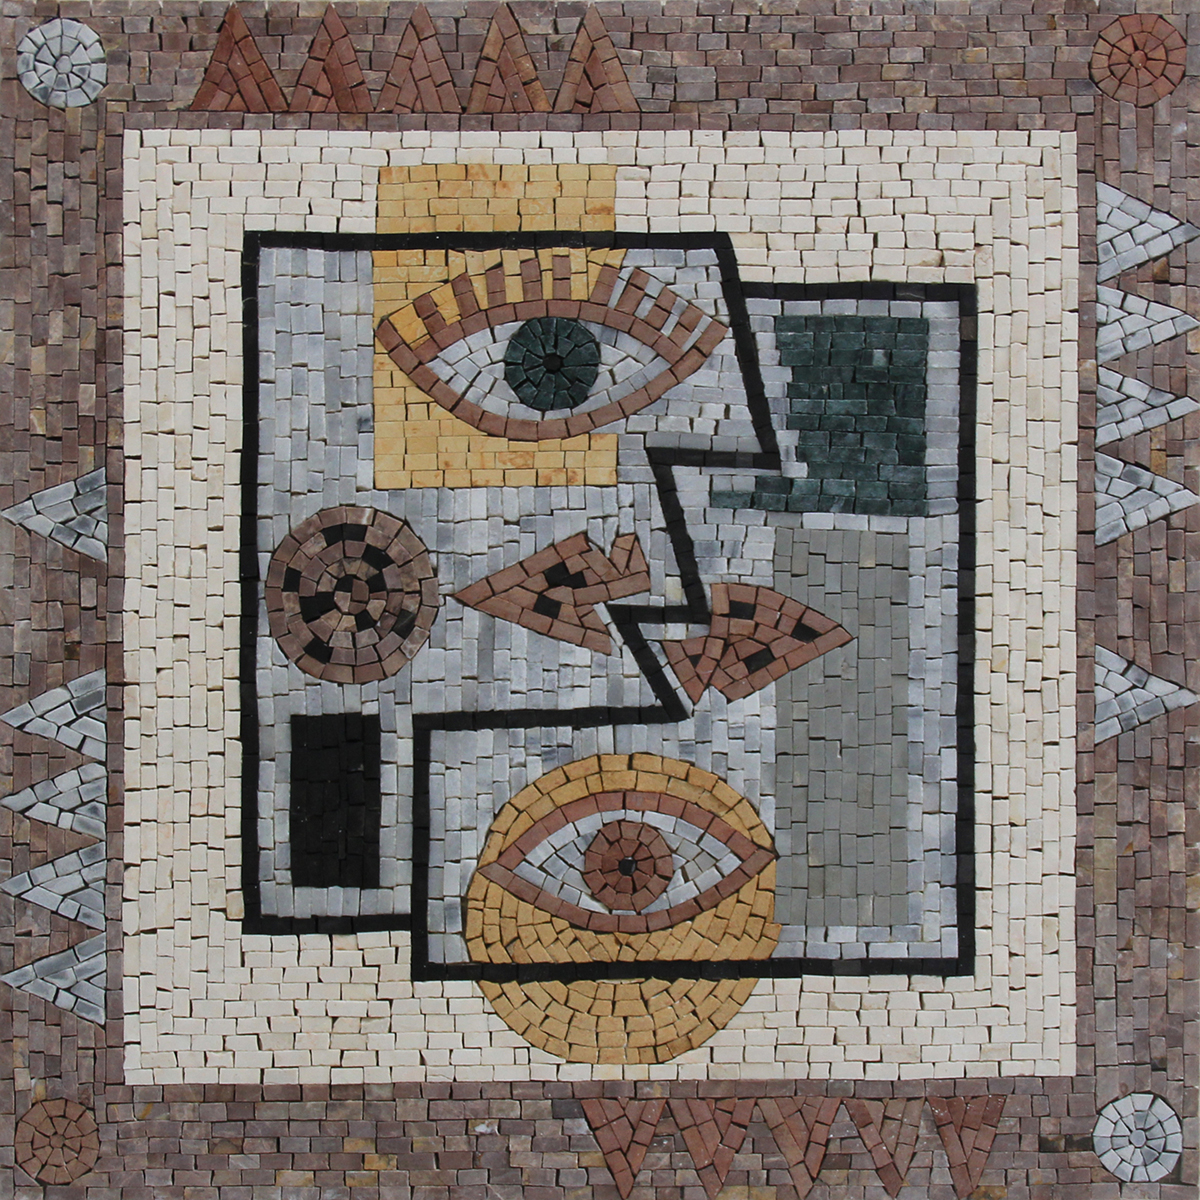 Abstract Geometrical Portrait Modern Art Mosaic Mosaic